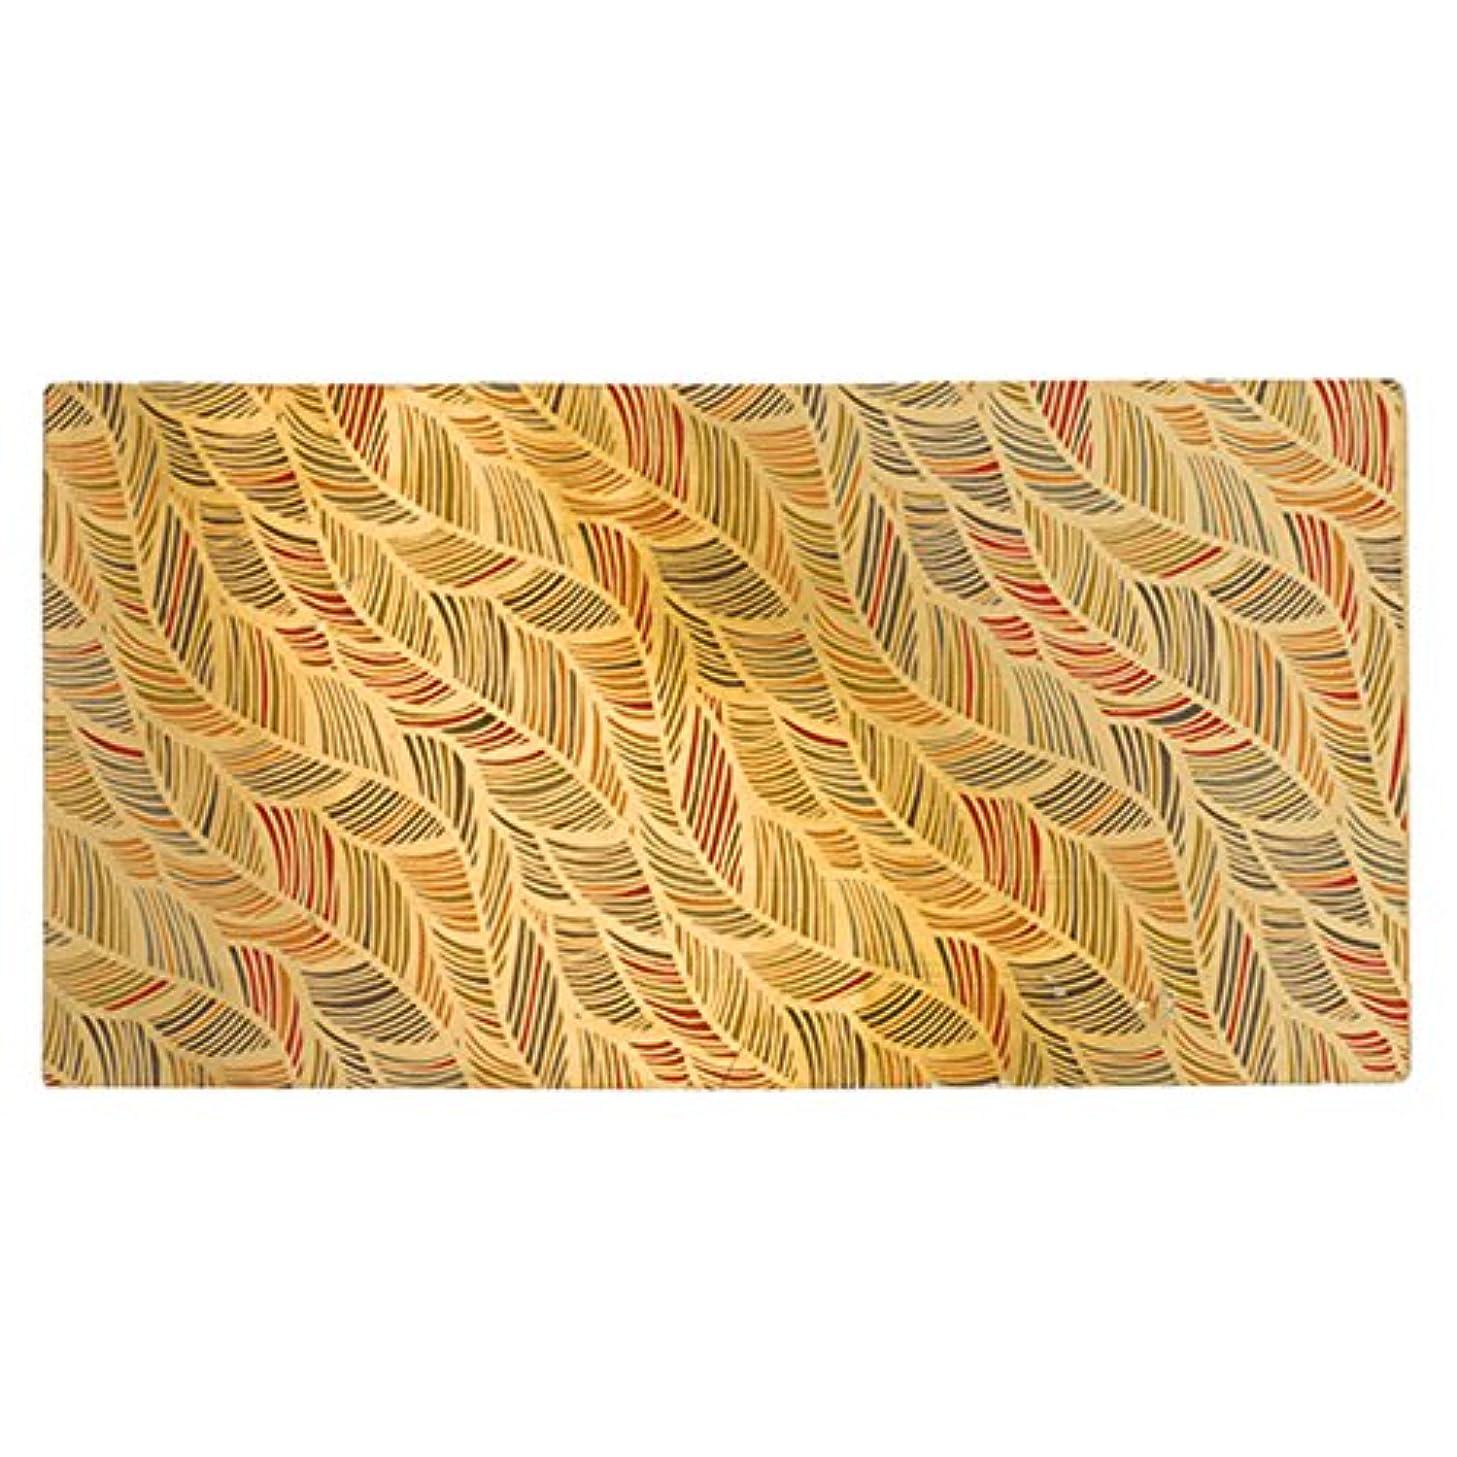 Efco Wax Sheet Feathers Silver, Gold, 20 x 10 x 5 cm